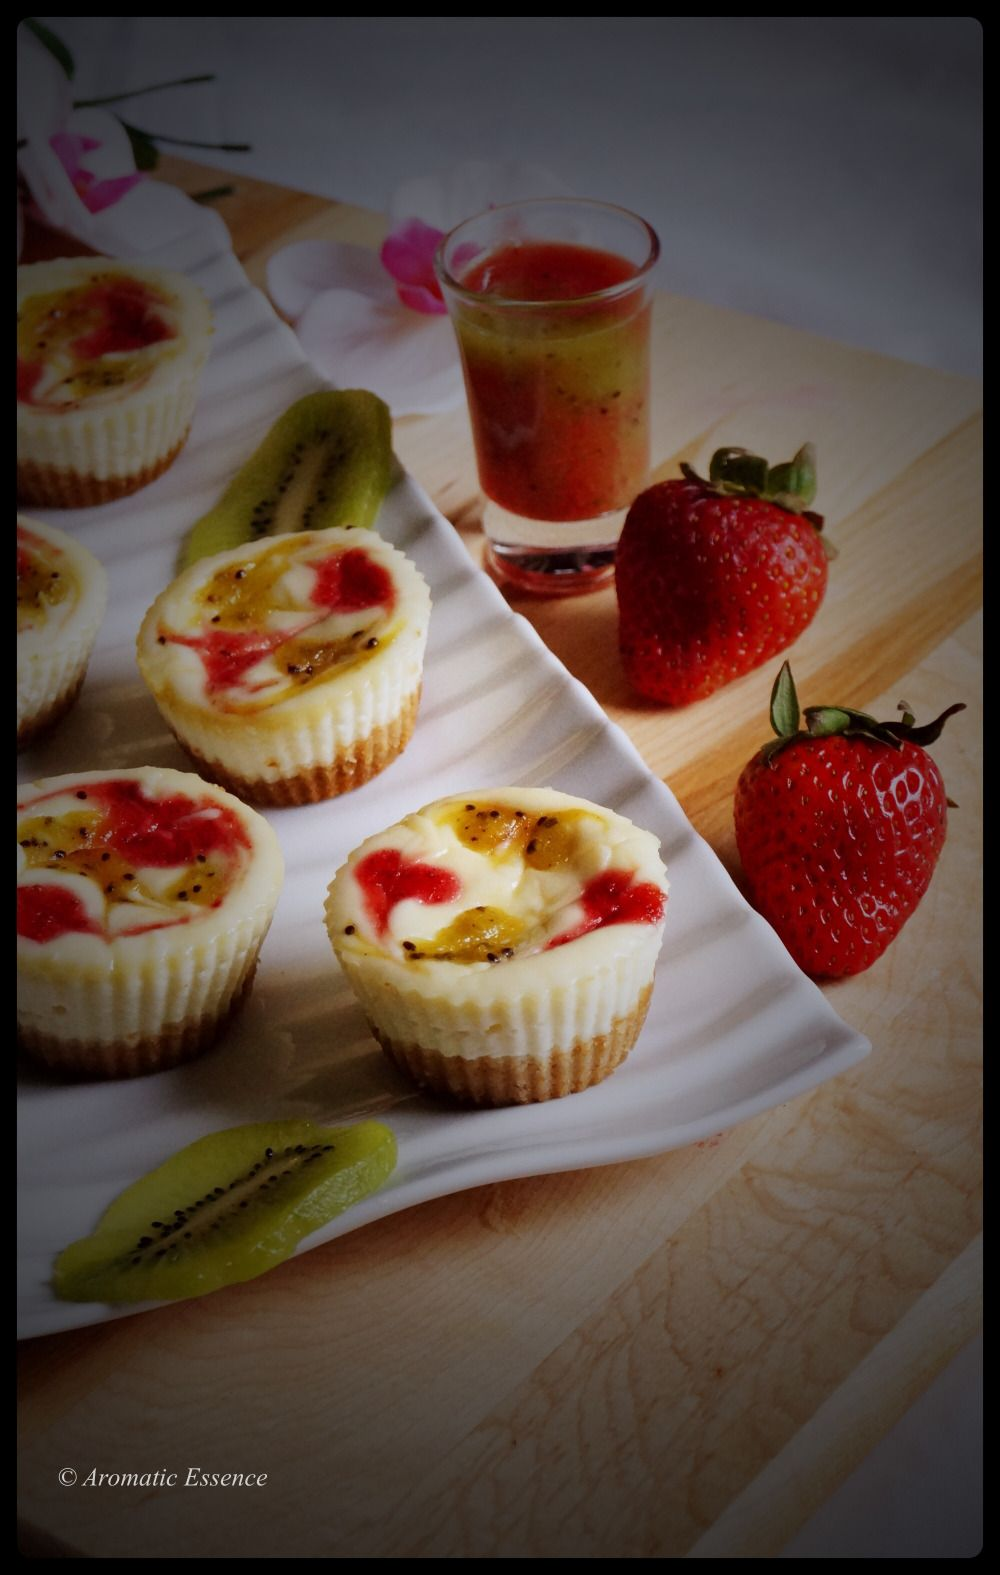 Strawberry and kiwi swirl muffin cheesecake